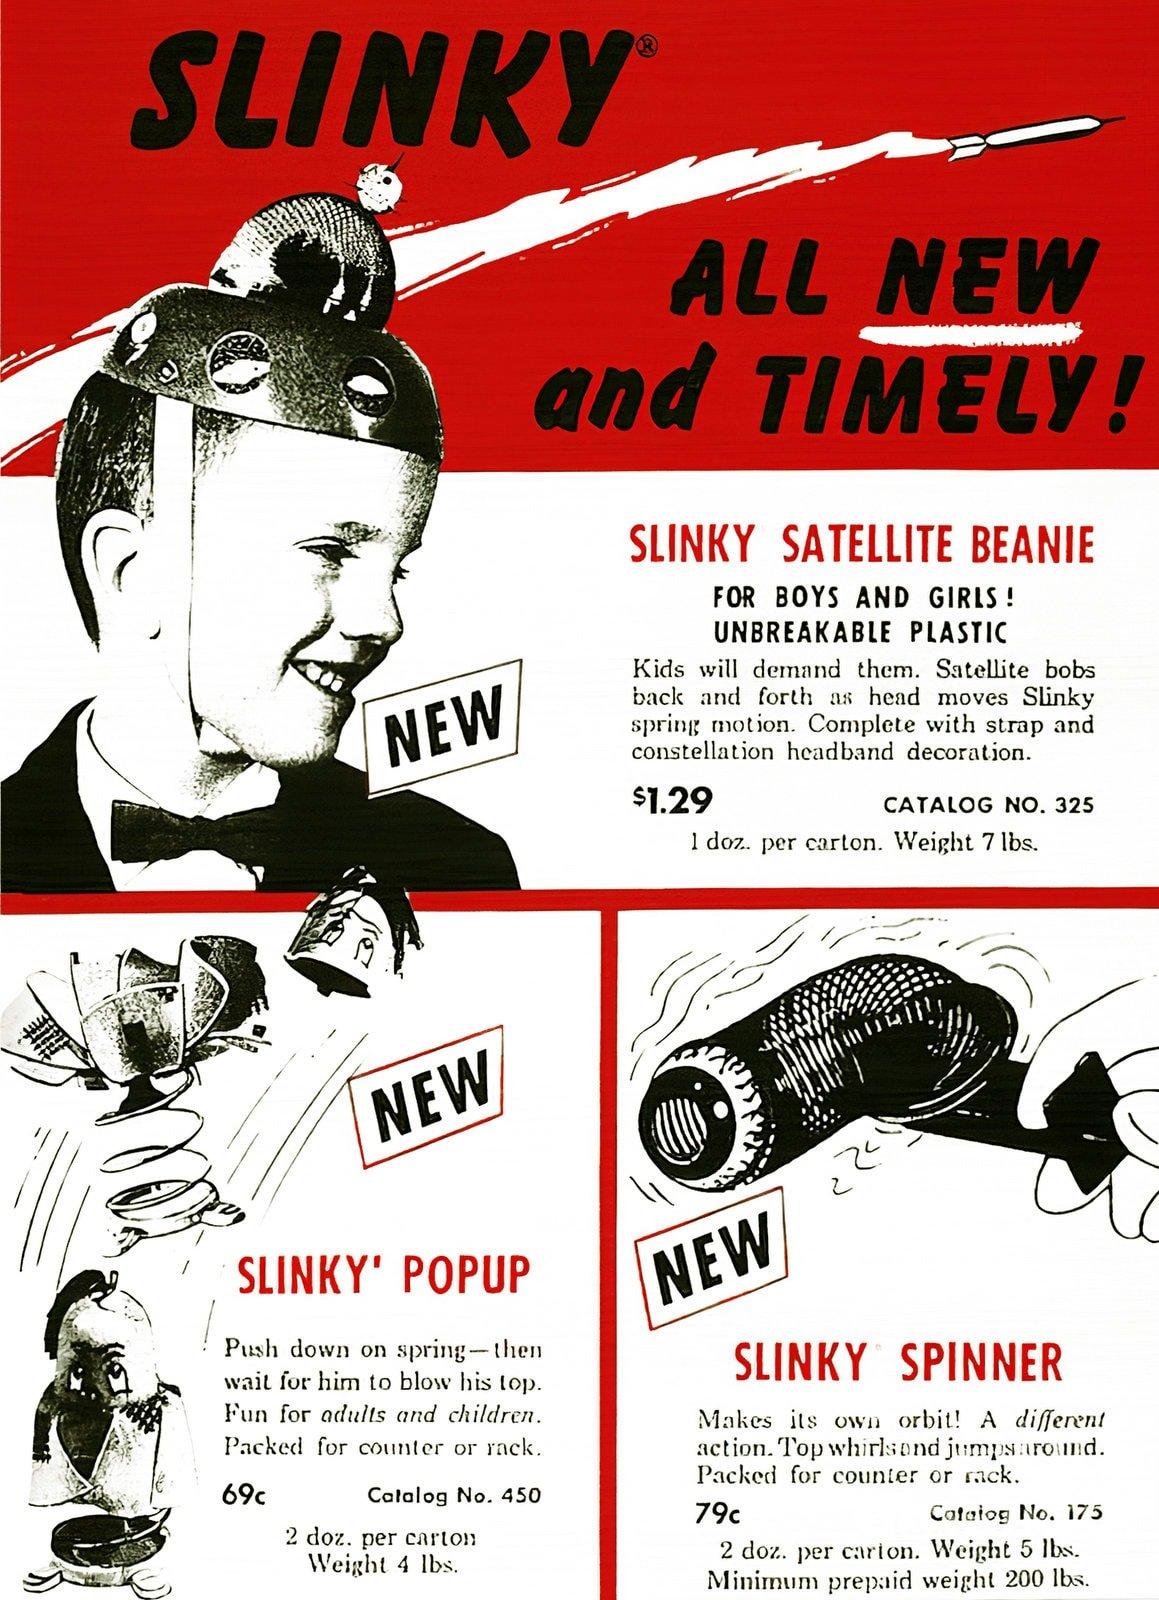 Old Slinky toys - Satellite Beanie - Popup - Spinner (1958)